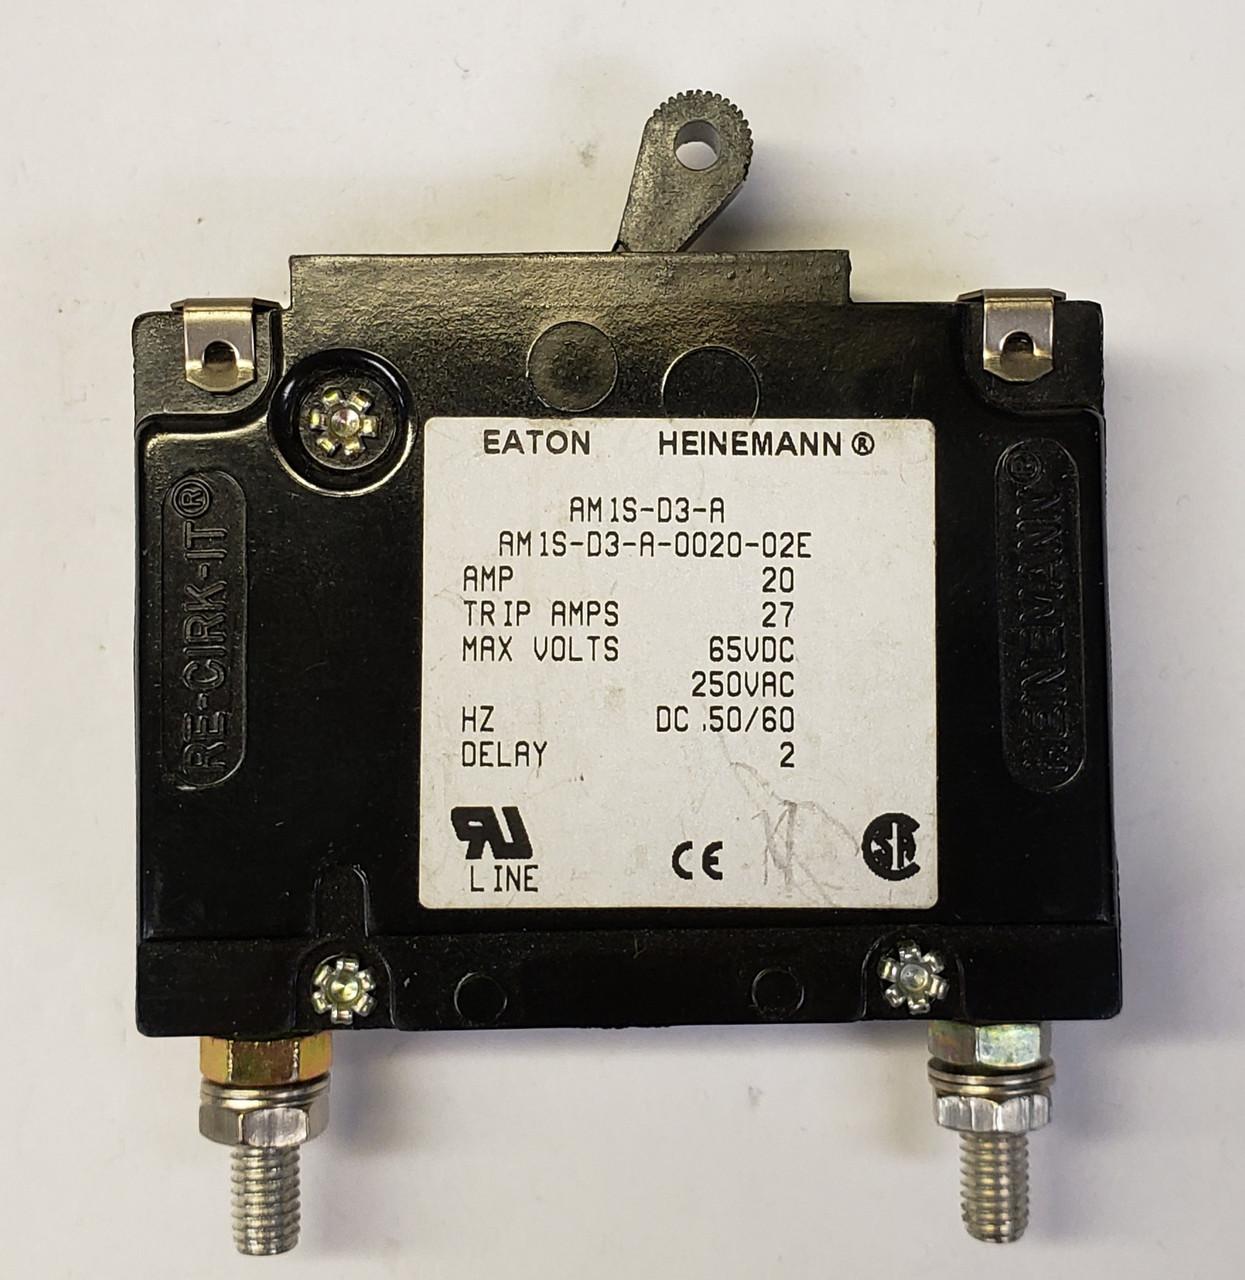 HEINEMANN  5A 250 V 1-Pole Breaker 5 Amp 250 VOLT AC AM1-A2-A-0005-02E